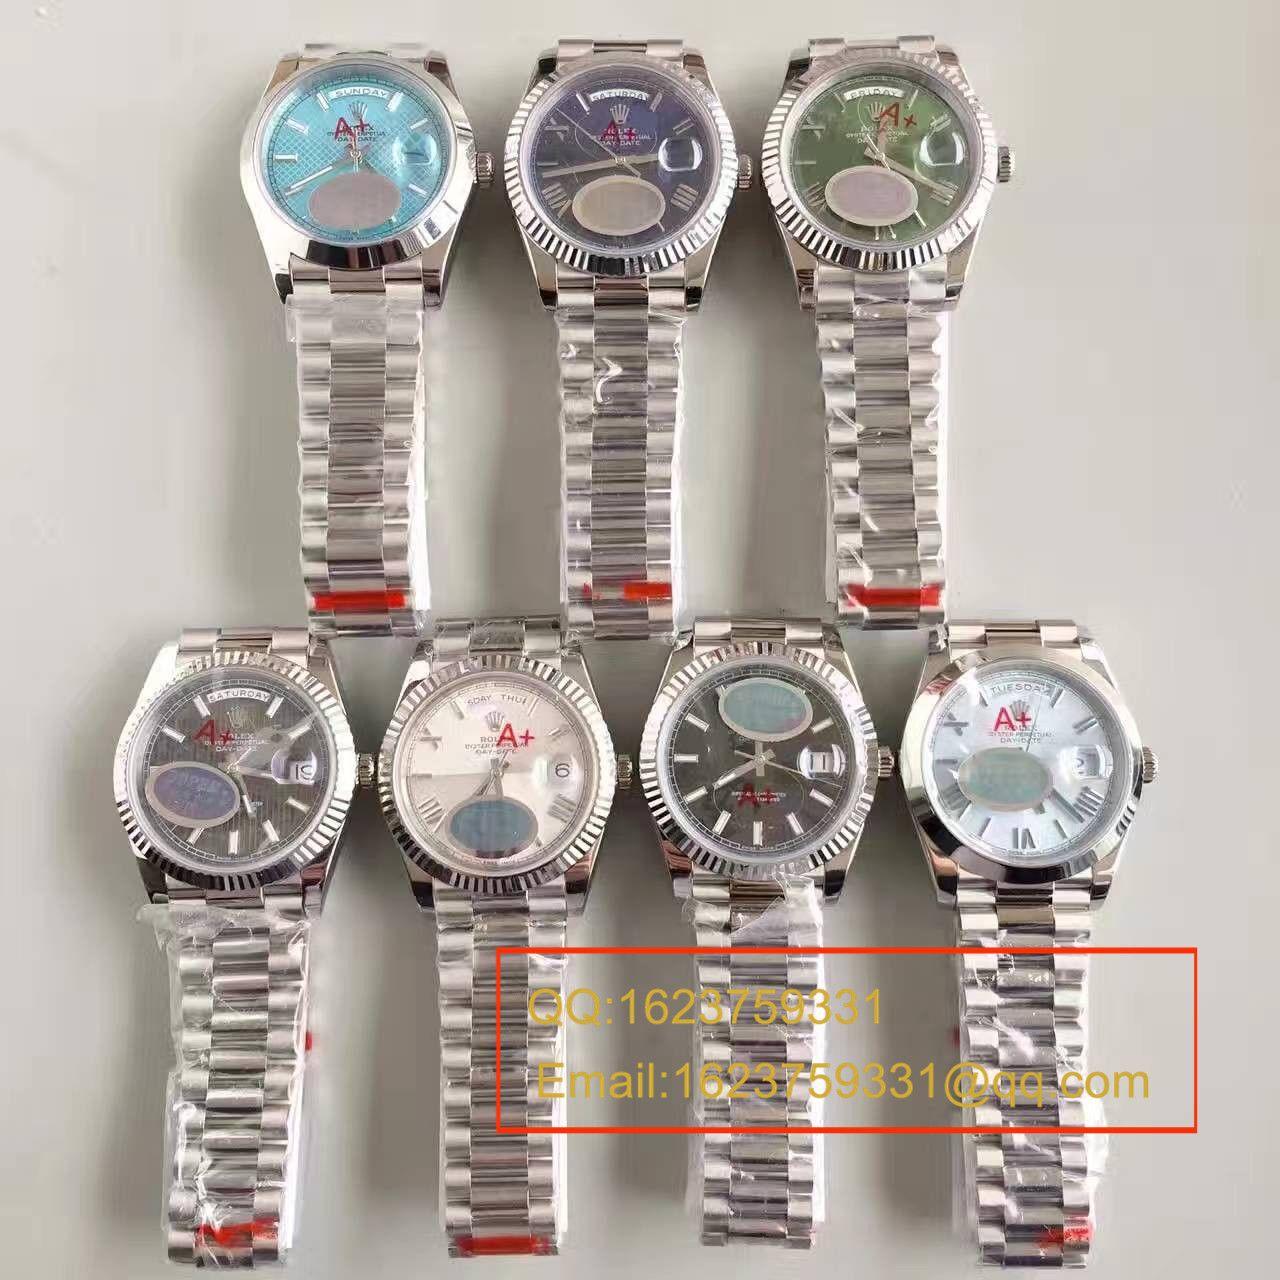 【NOOB厂超A精仿手表】劳力士星期日历型系列228239-黑盘腕表 / RBE070